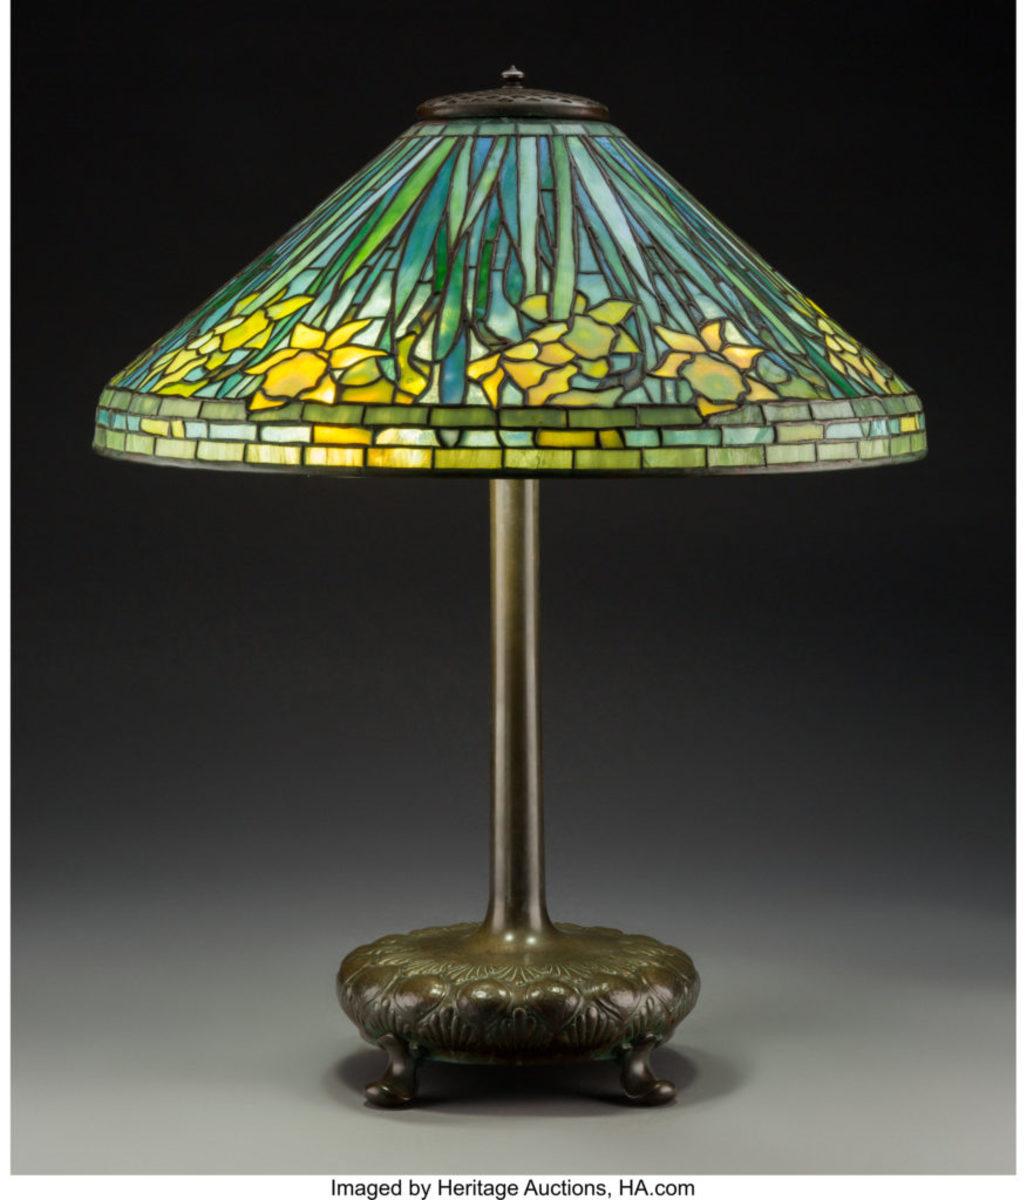 Tiffany Lamp Lights Up Heritage